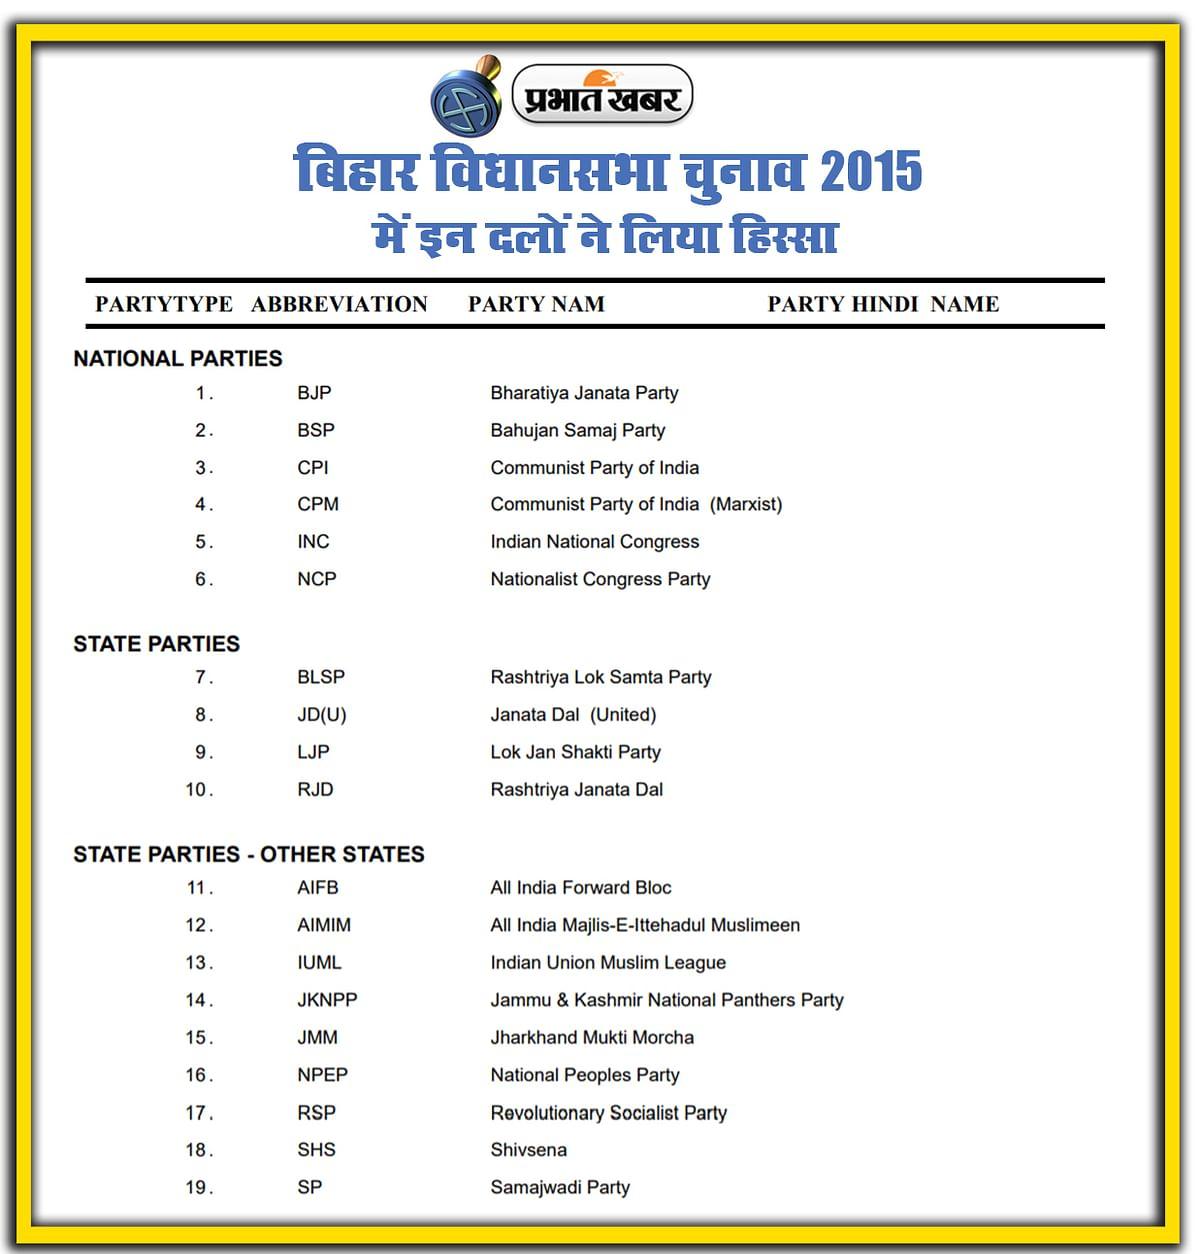 bihar vidhan sabha chunav 2015, National, State, Local Parties in Election